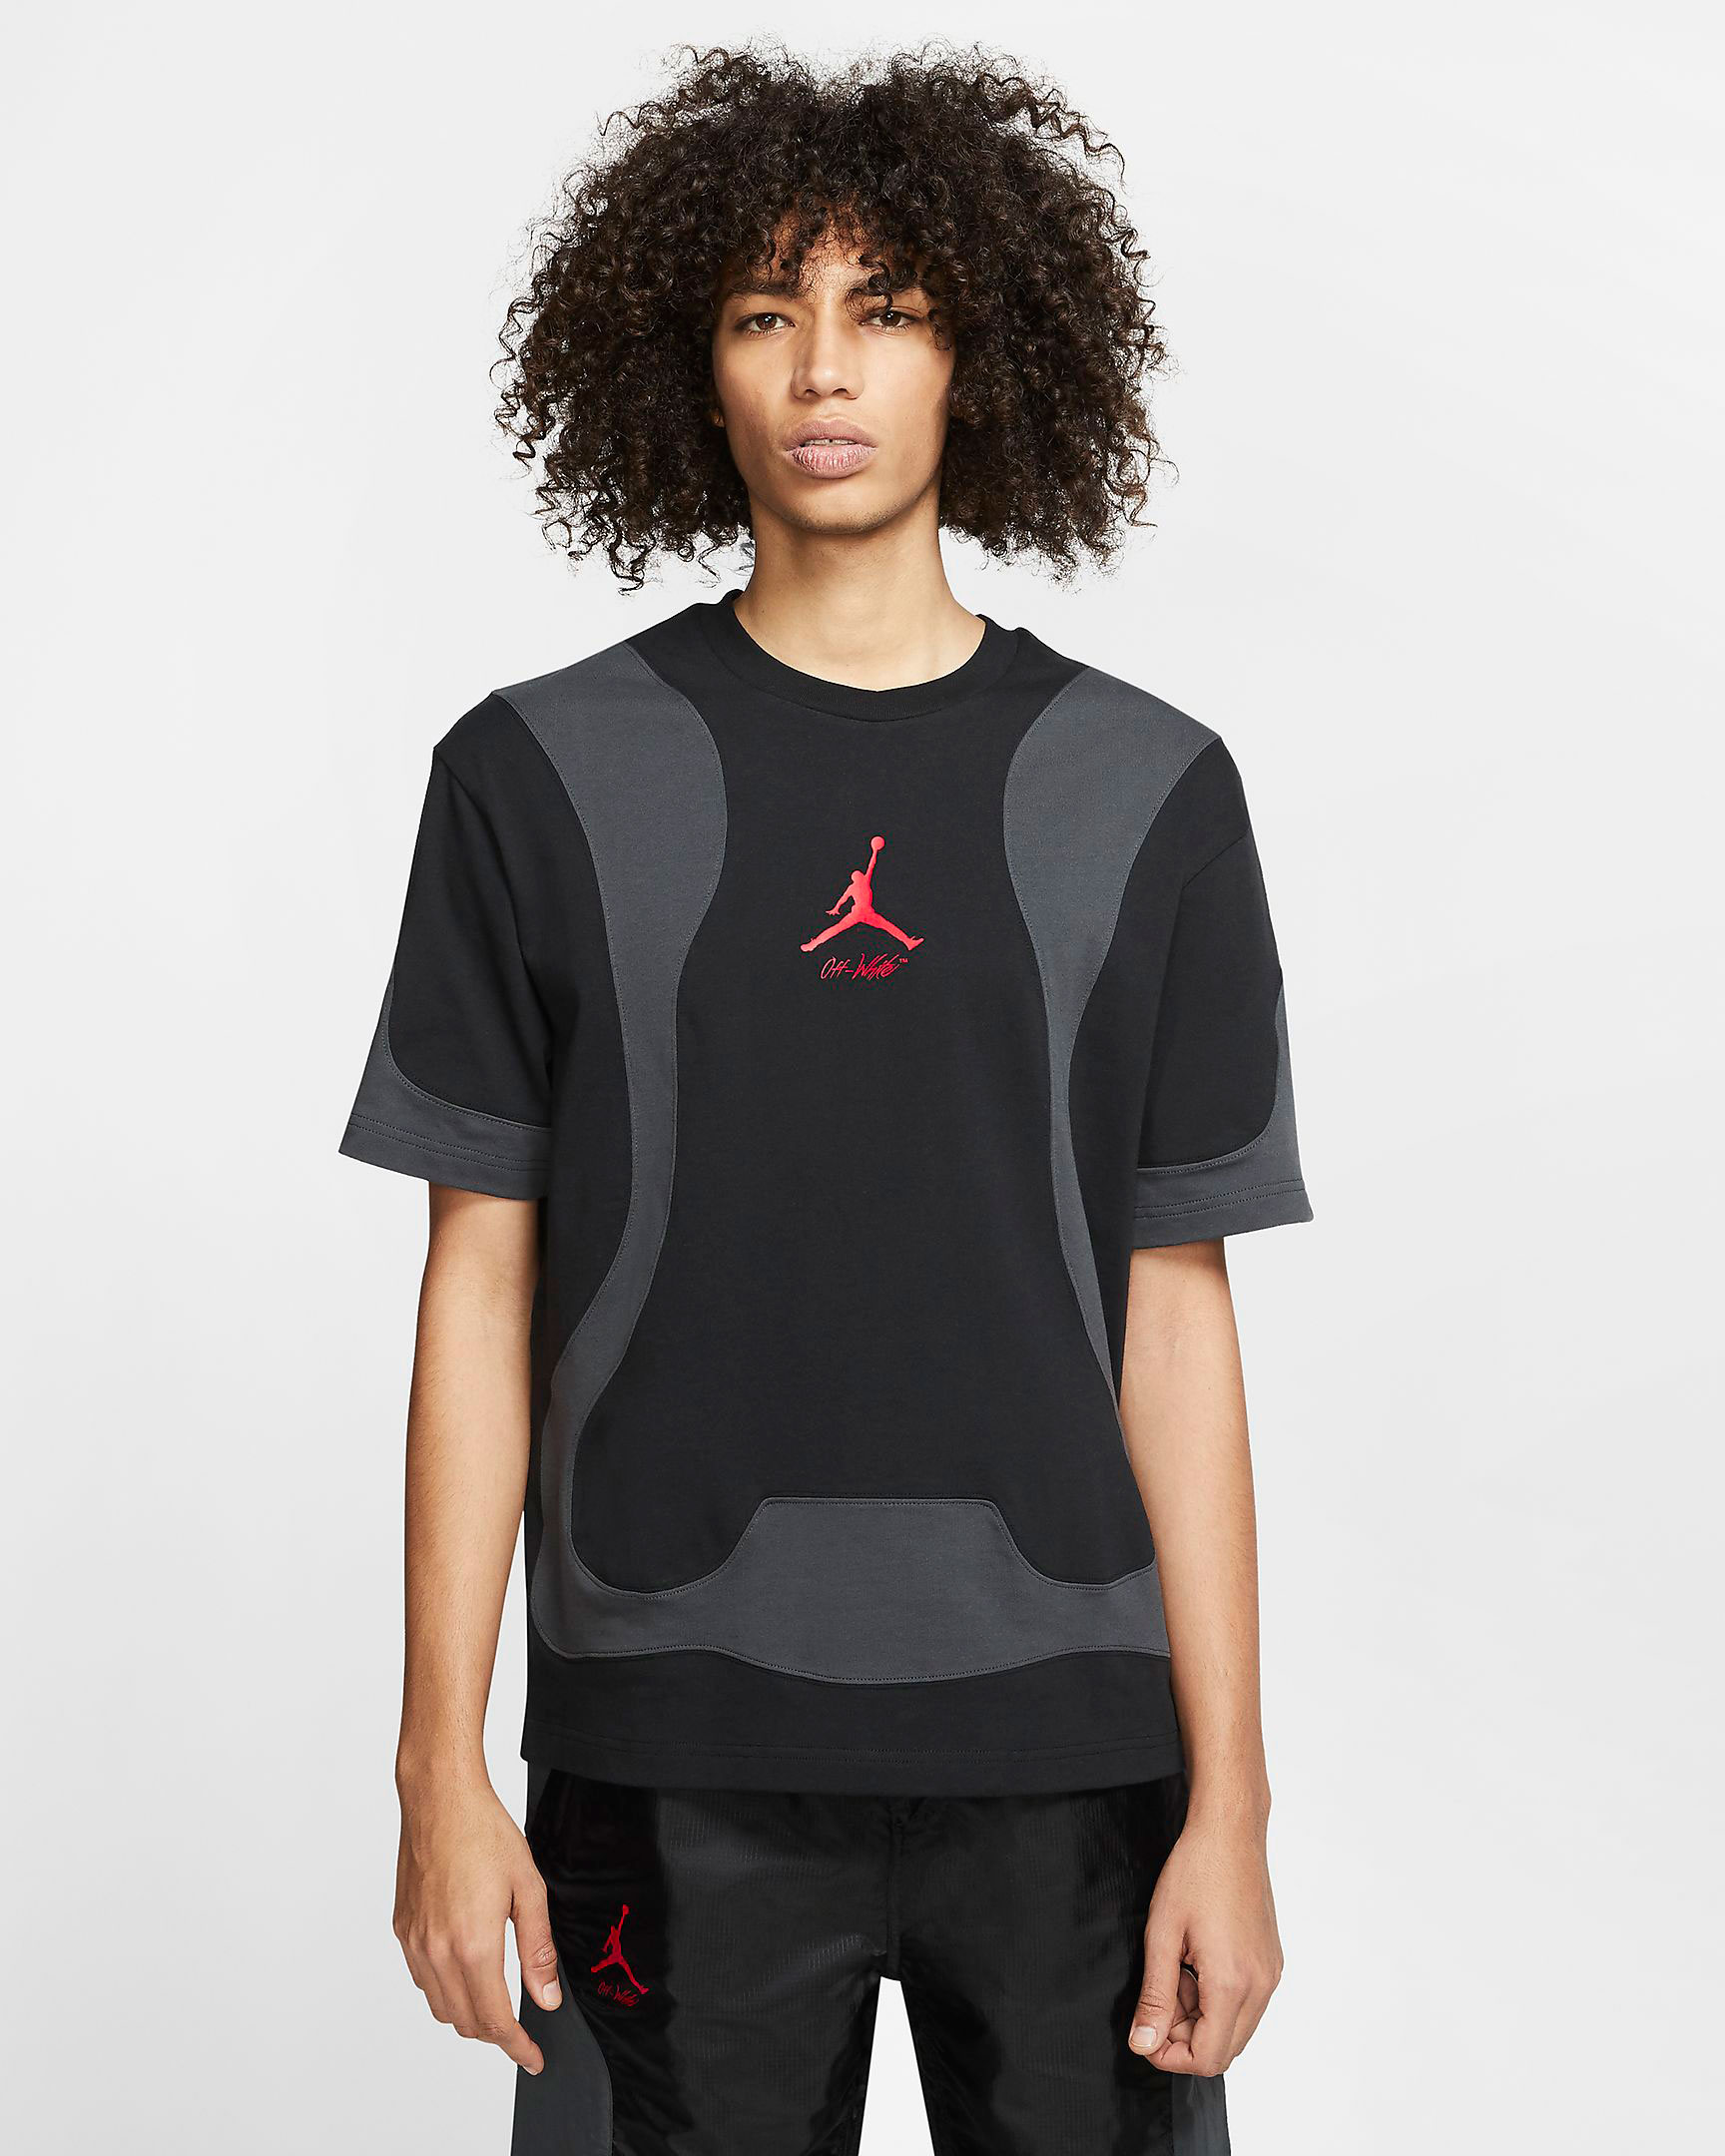 off-white-jordan-5-shirt-1